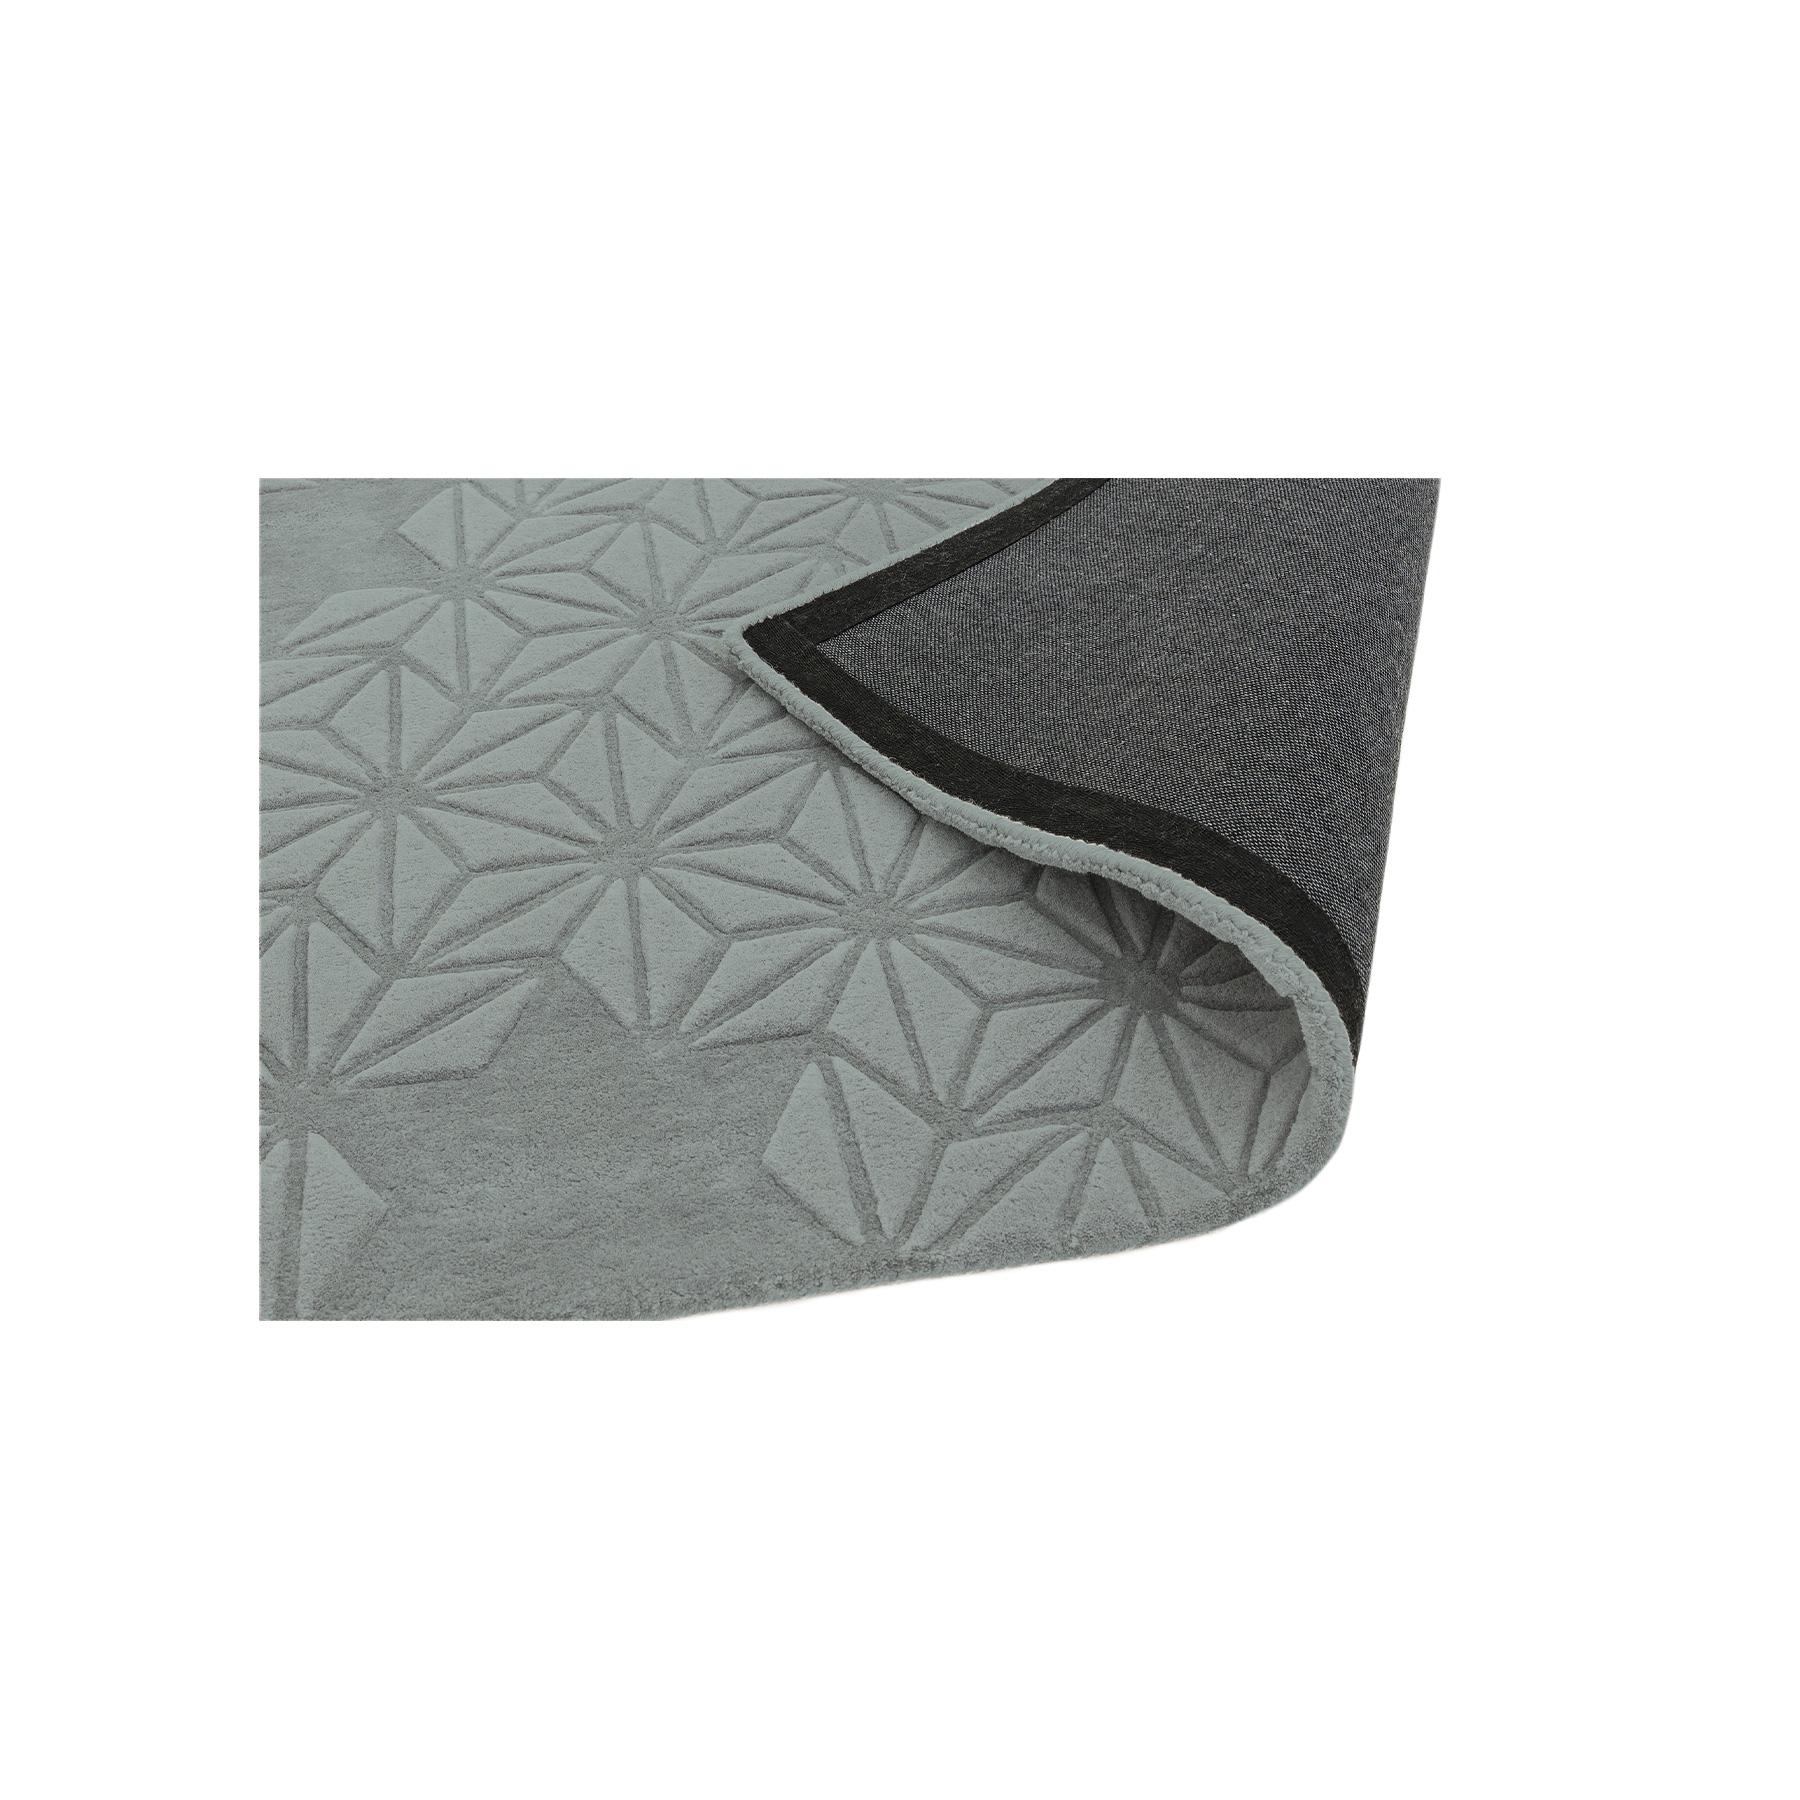 Starburst Silver Rug